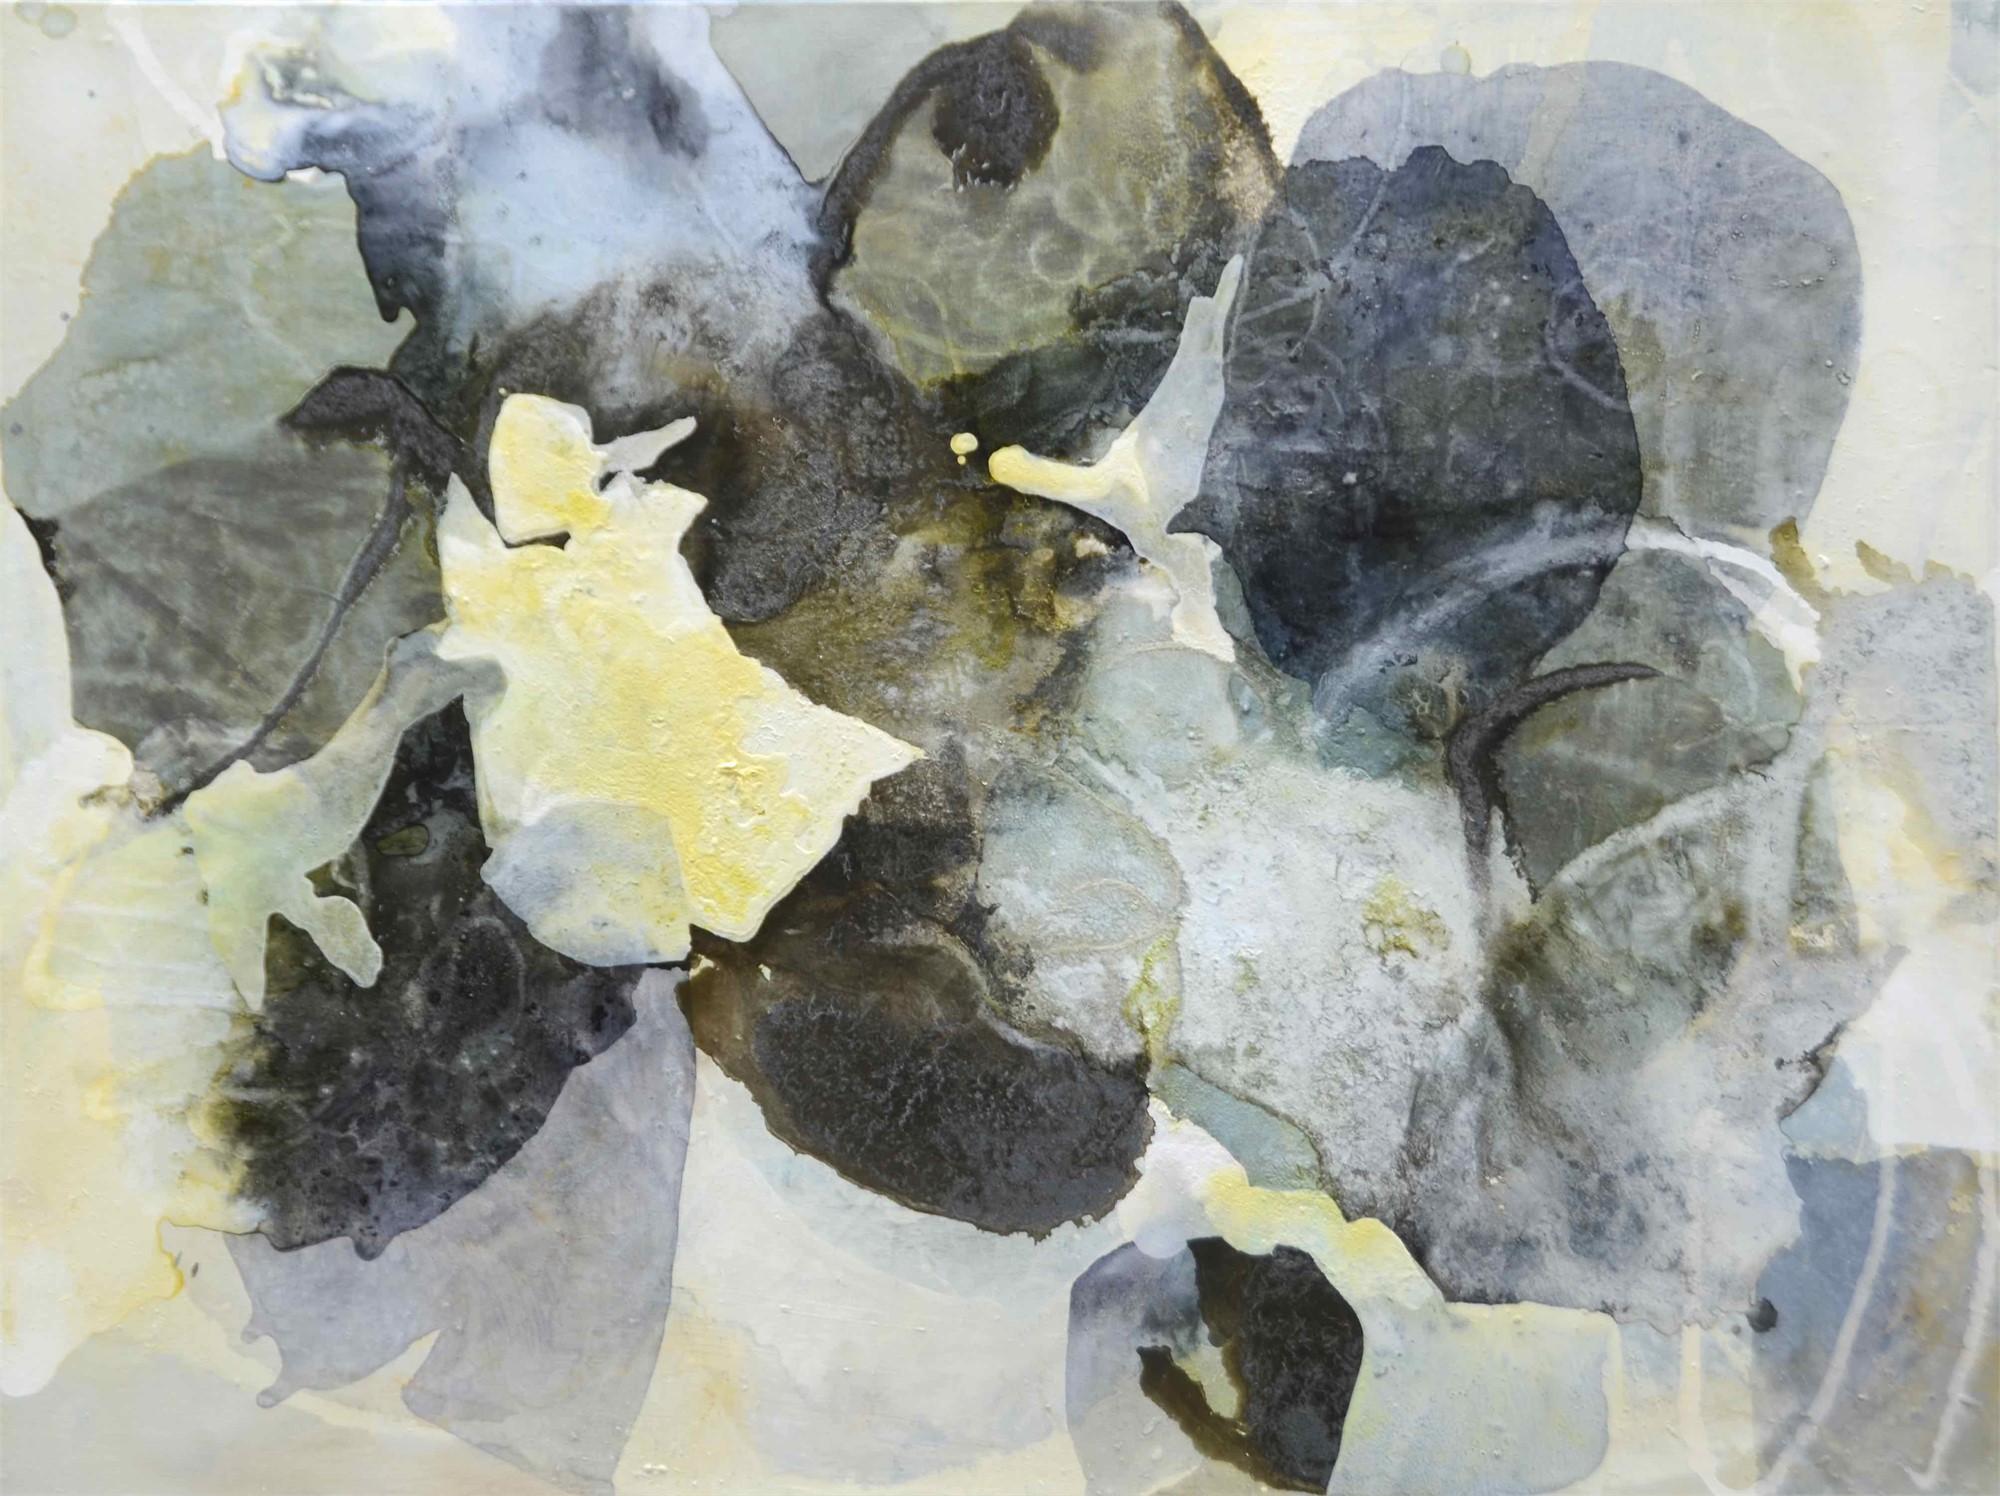 Shade 2 by Liz Barber